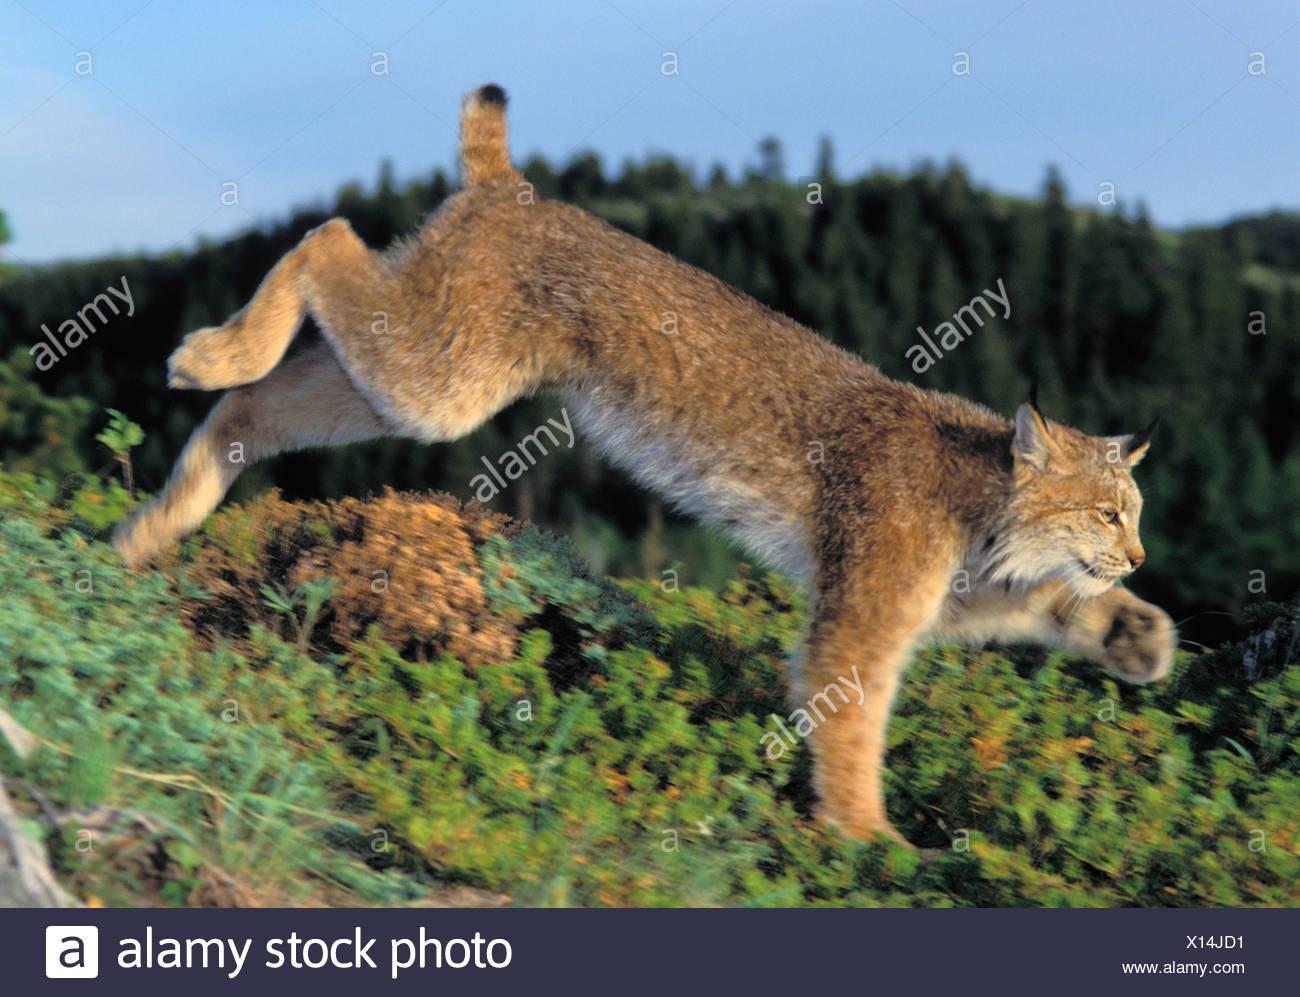 Tk0610, Thomas Kitchin; Lynx Running. Summer. Rocky Mountains. North America. Felis Lynx Canadensis. - Stock Image